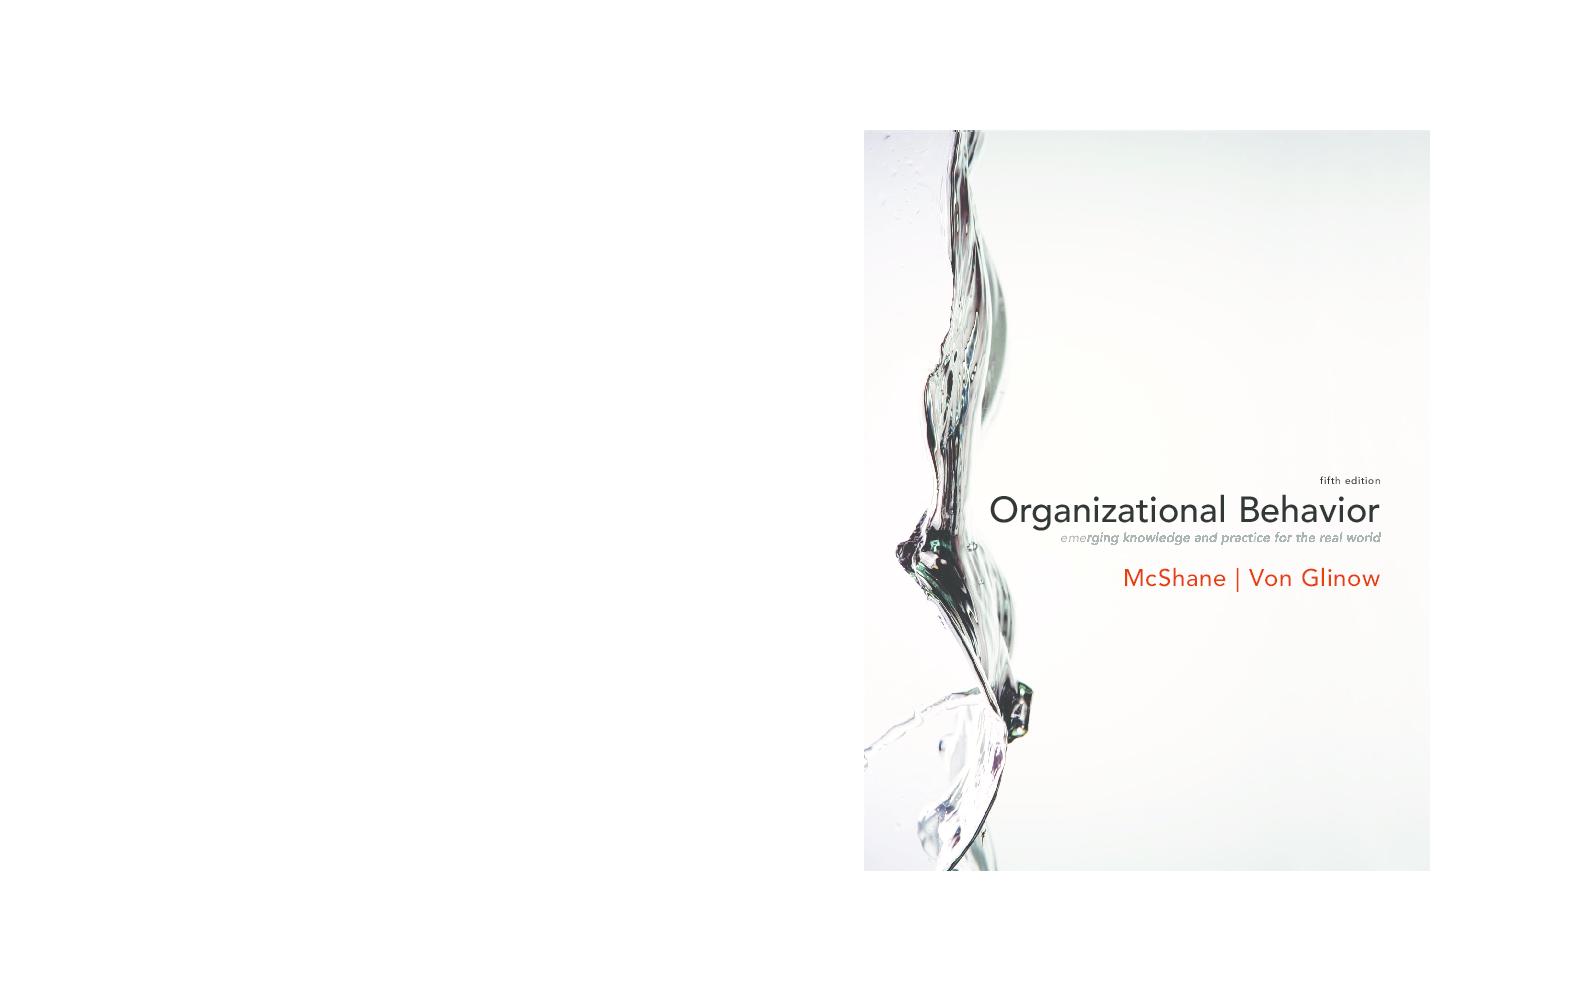 Pdf Organizational Behavior 5th Edition Rizky Ardani Academia Edu